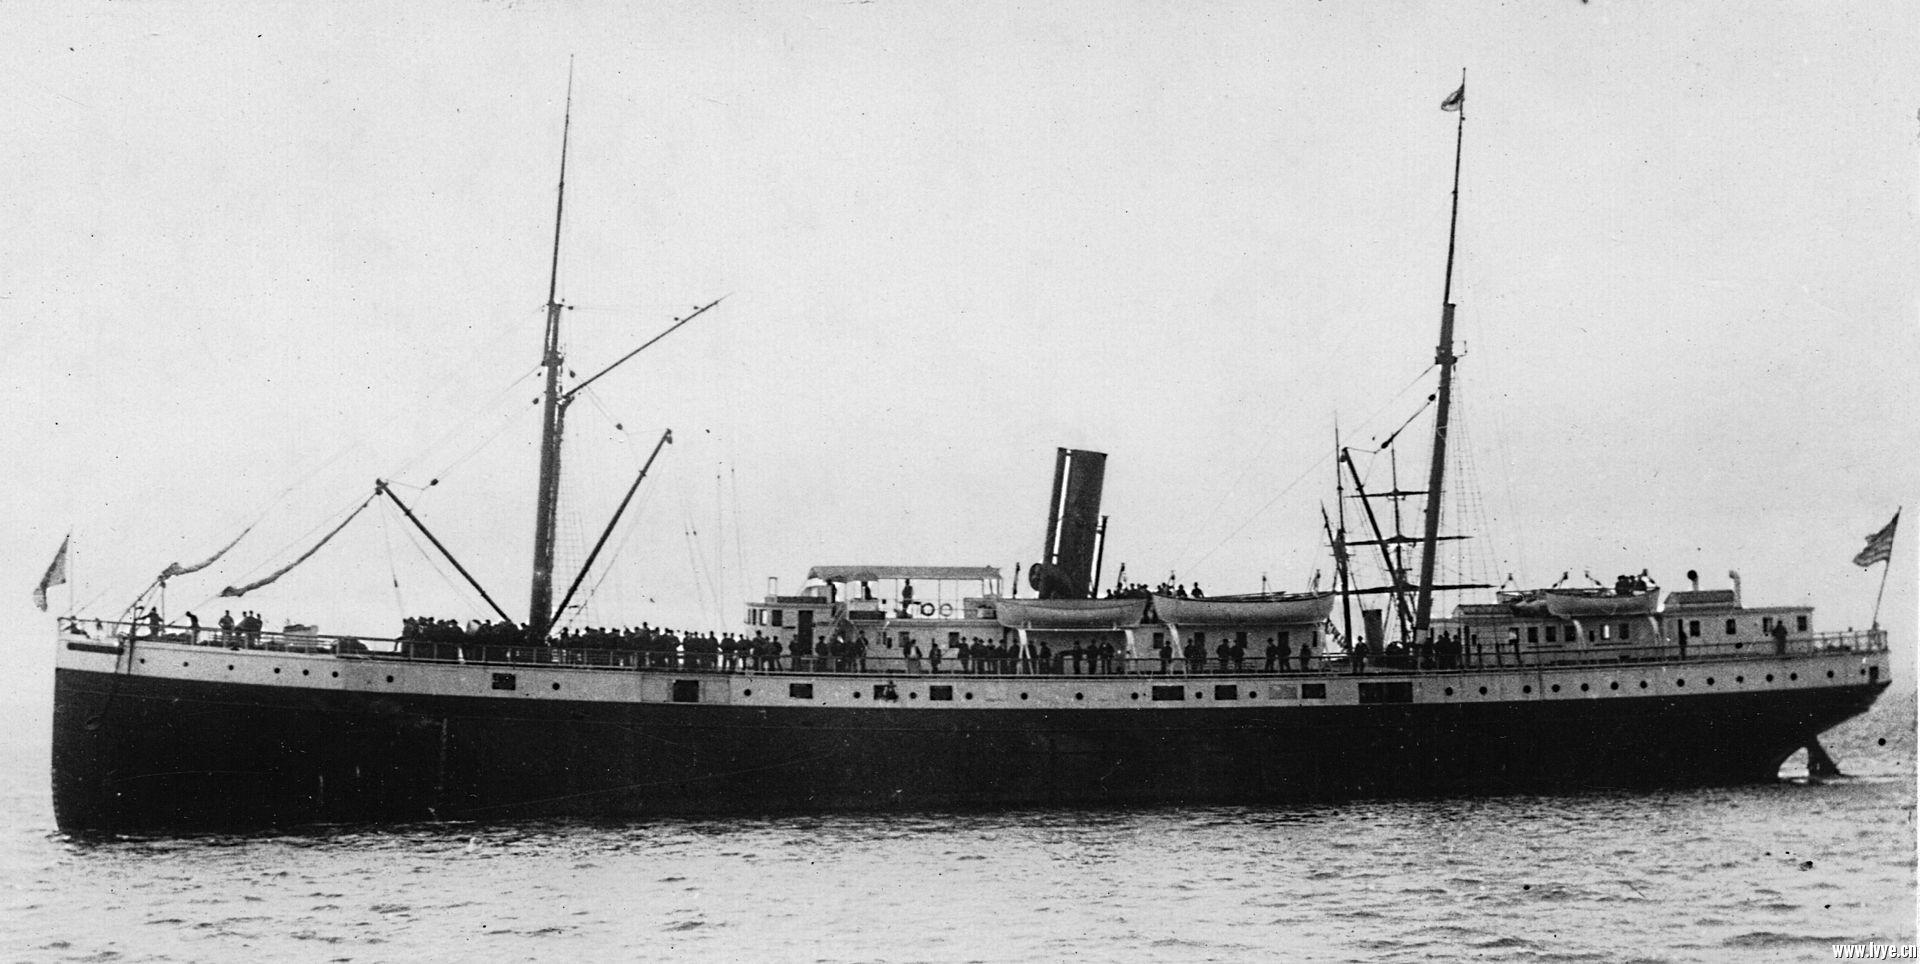 1920px-SS_Valencia_Photograph_1900.jpg